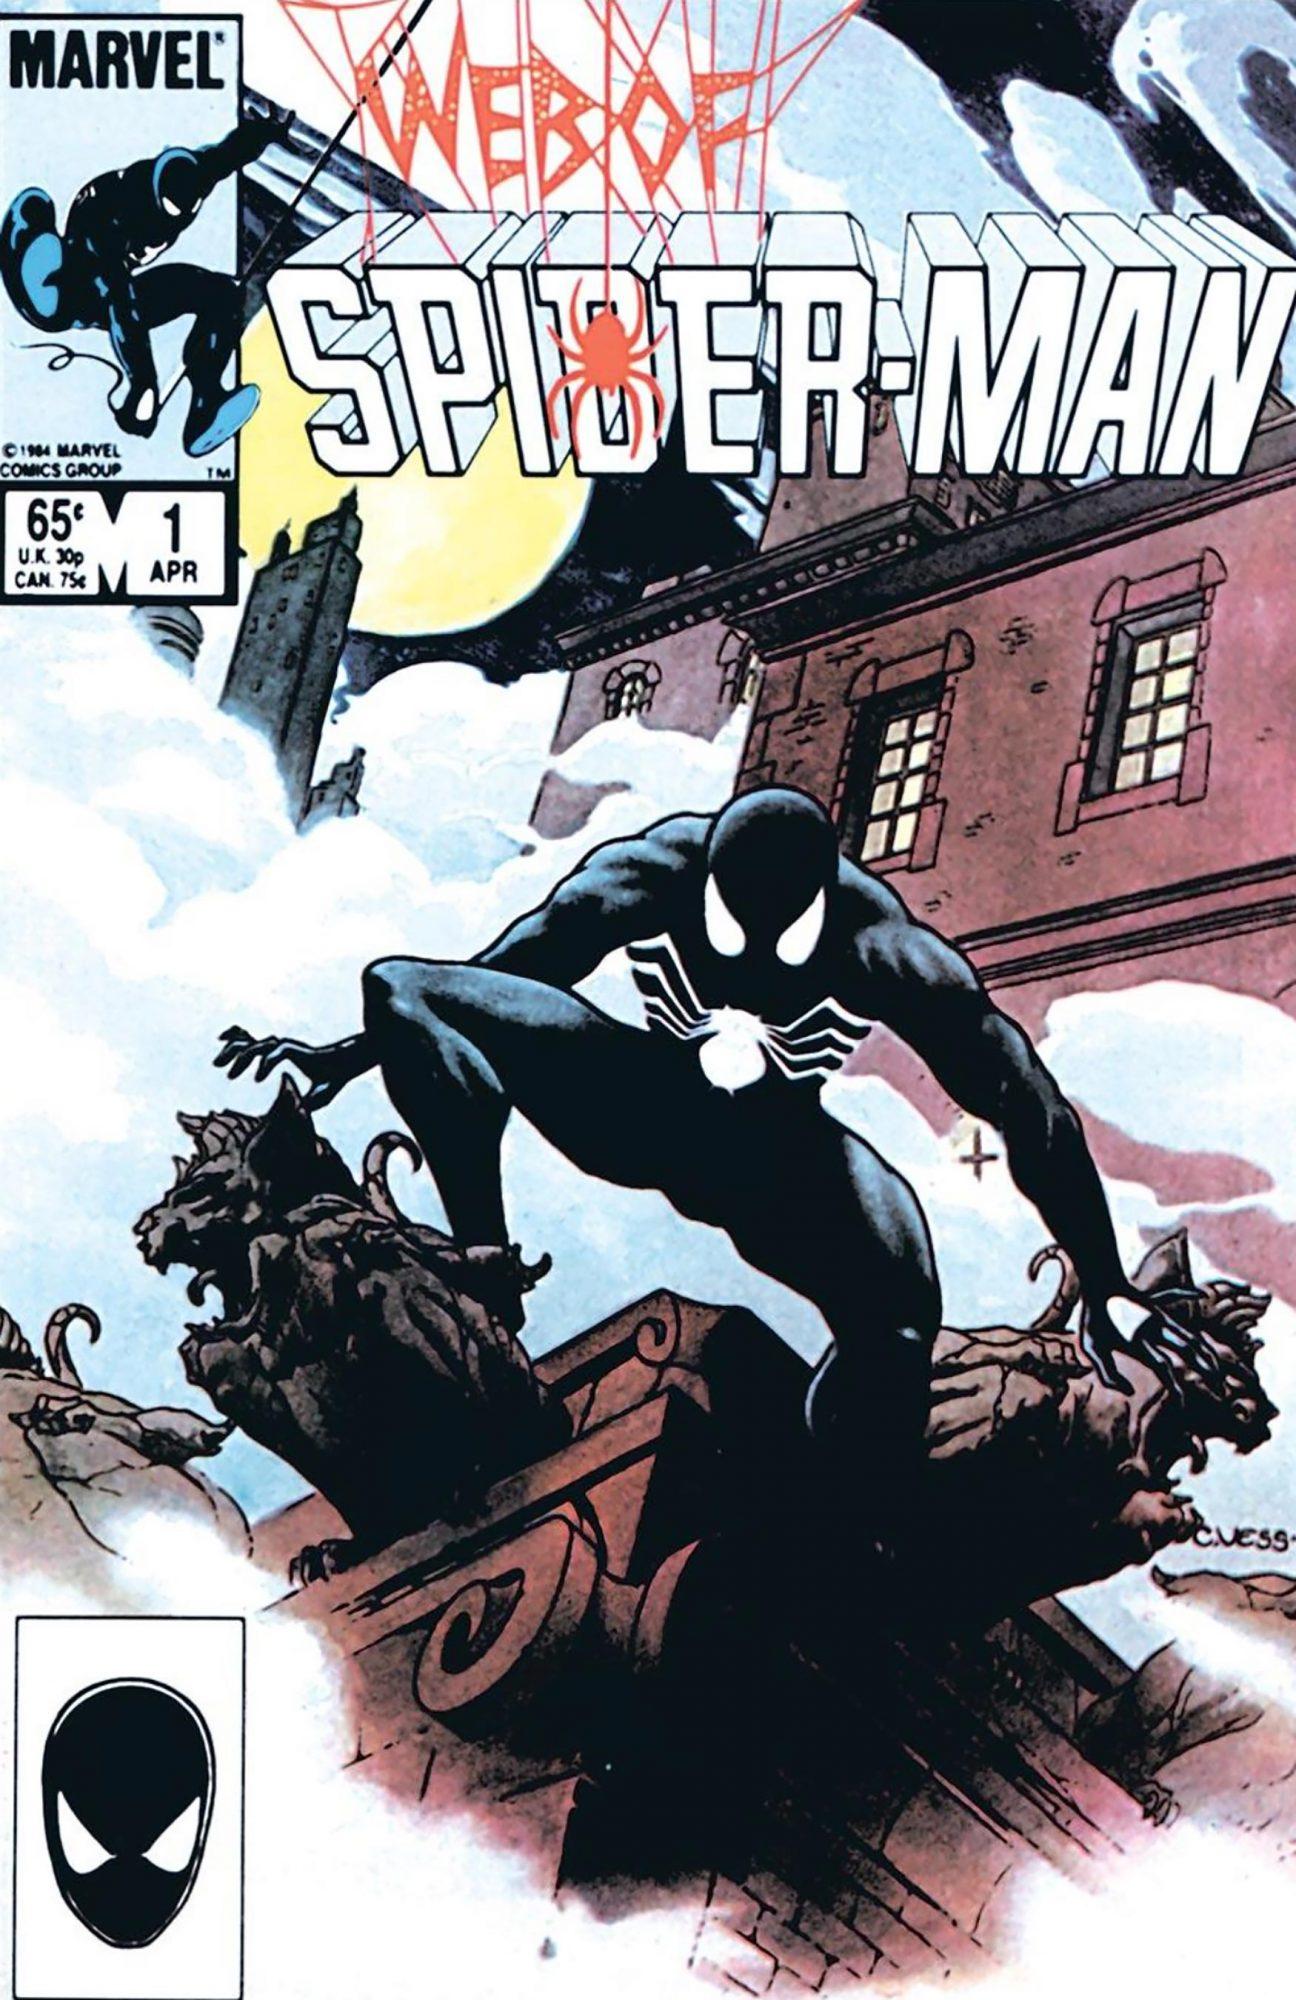 Web of Spider-Man #1Charles Vess, 1985